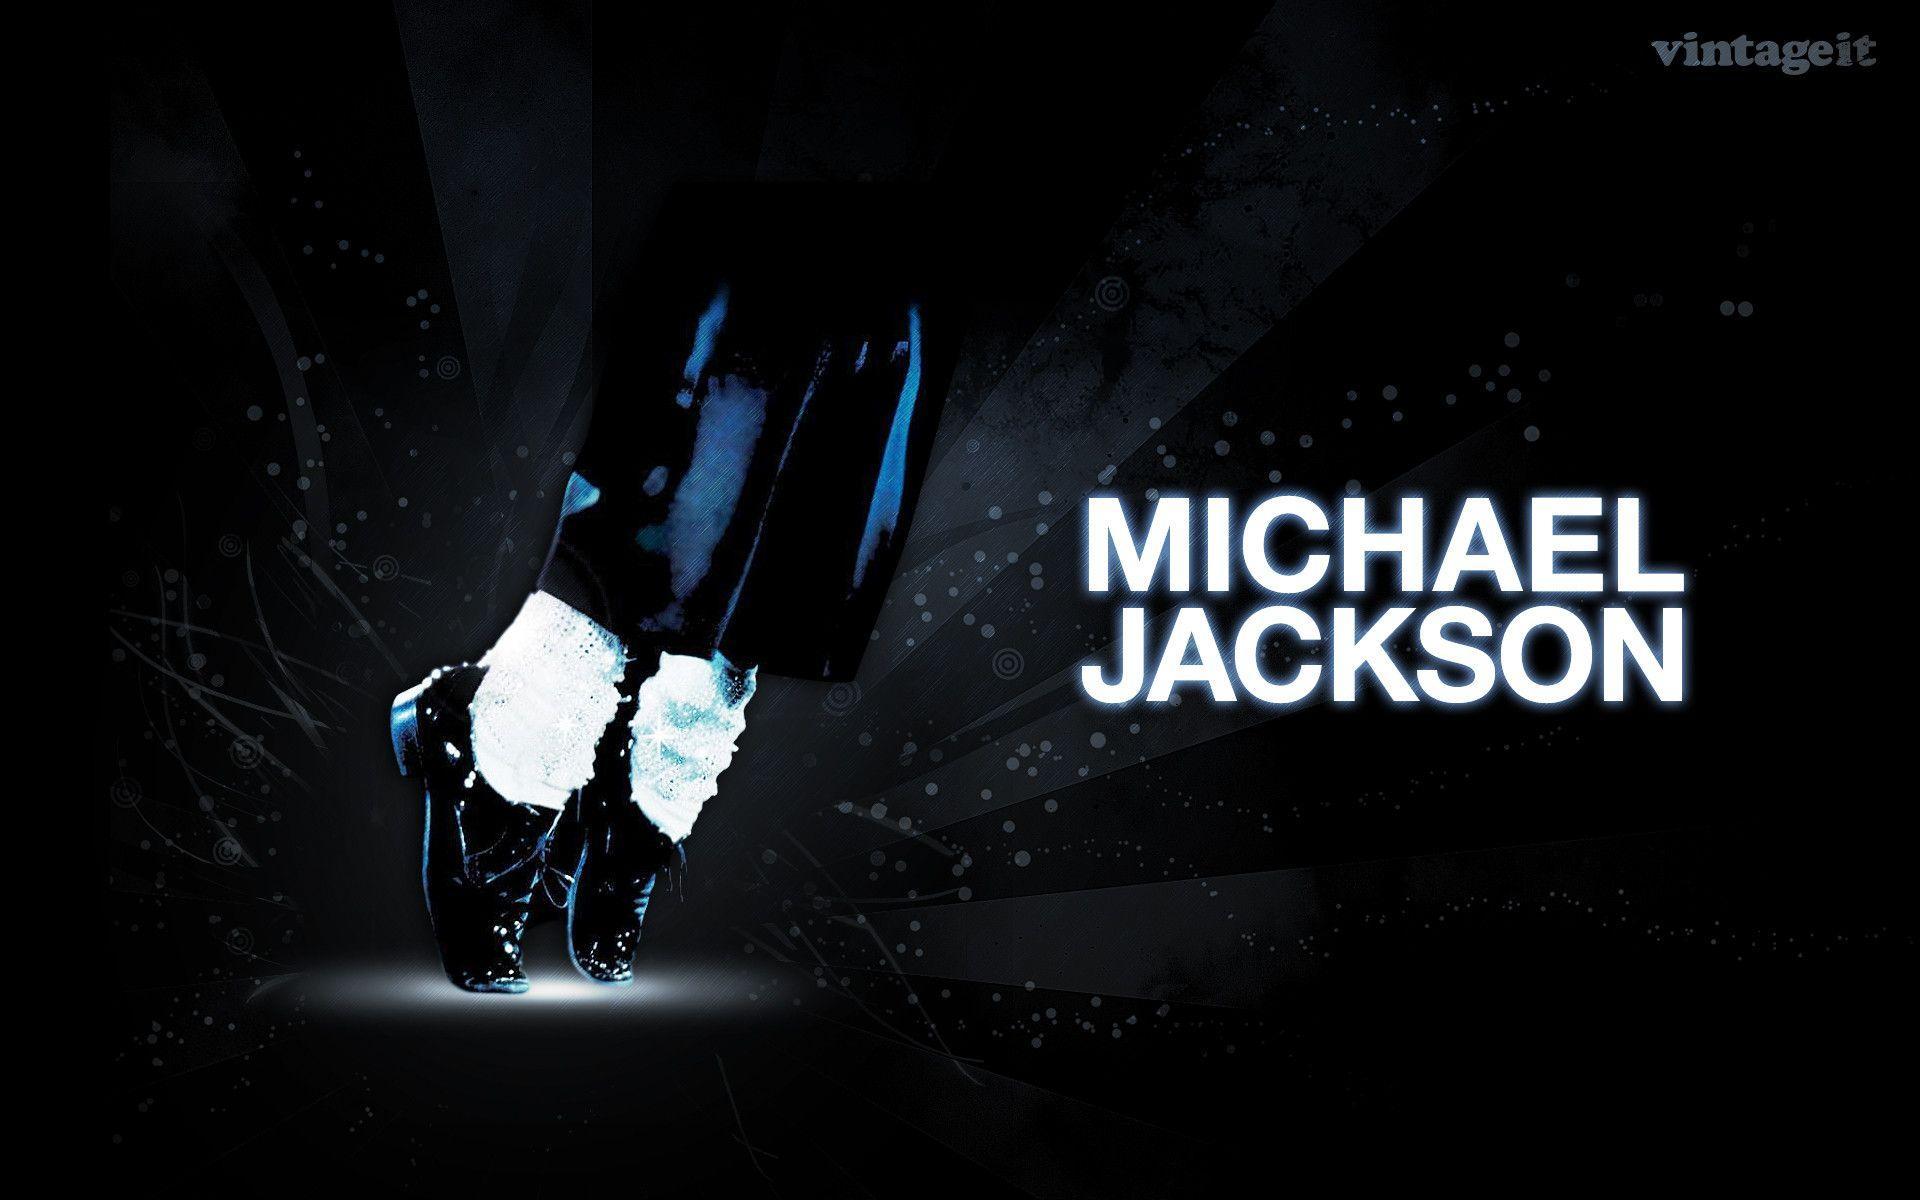 Michael Jackson Wallpapers For Computer